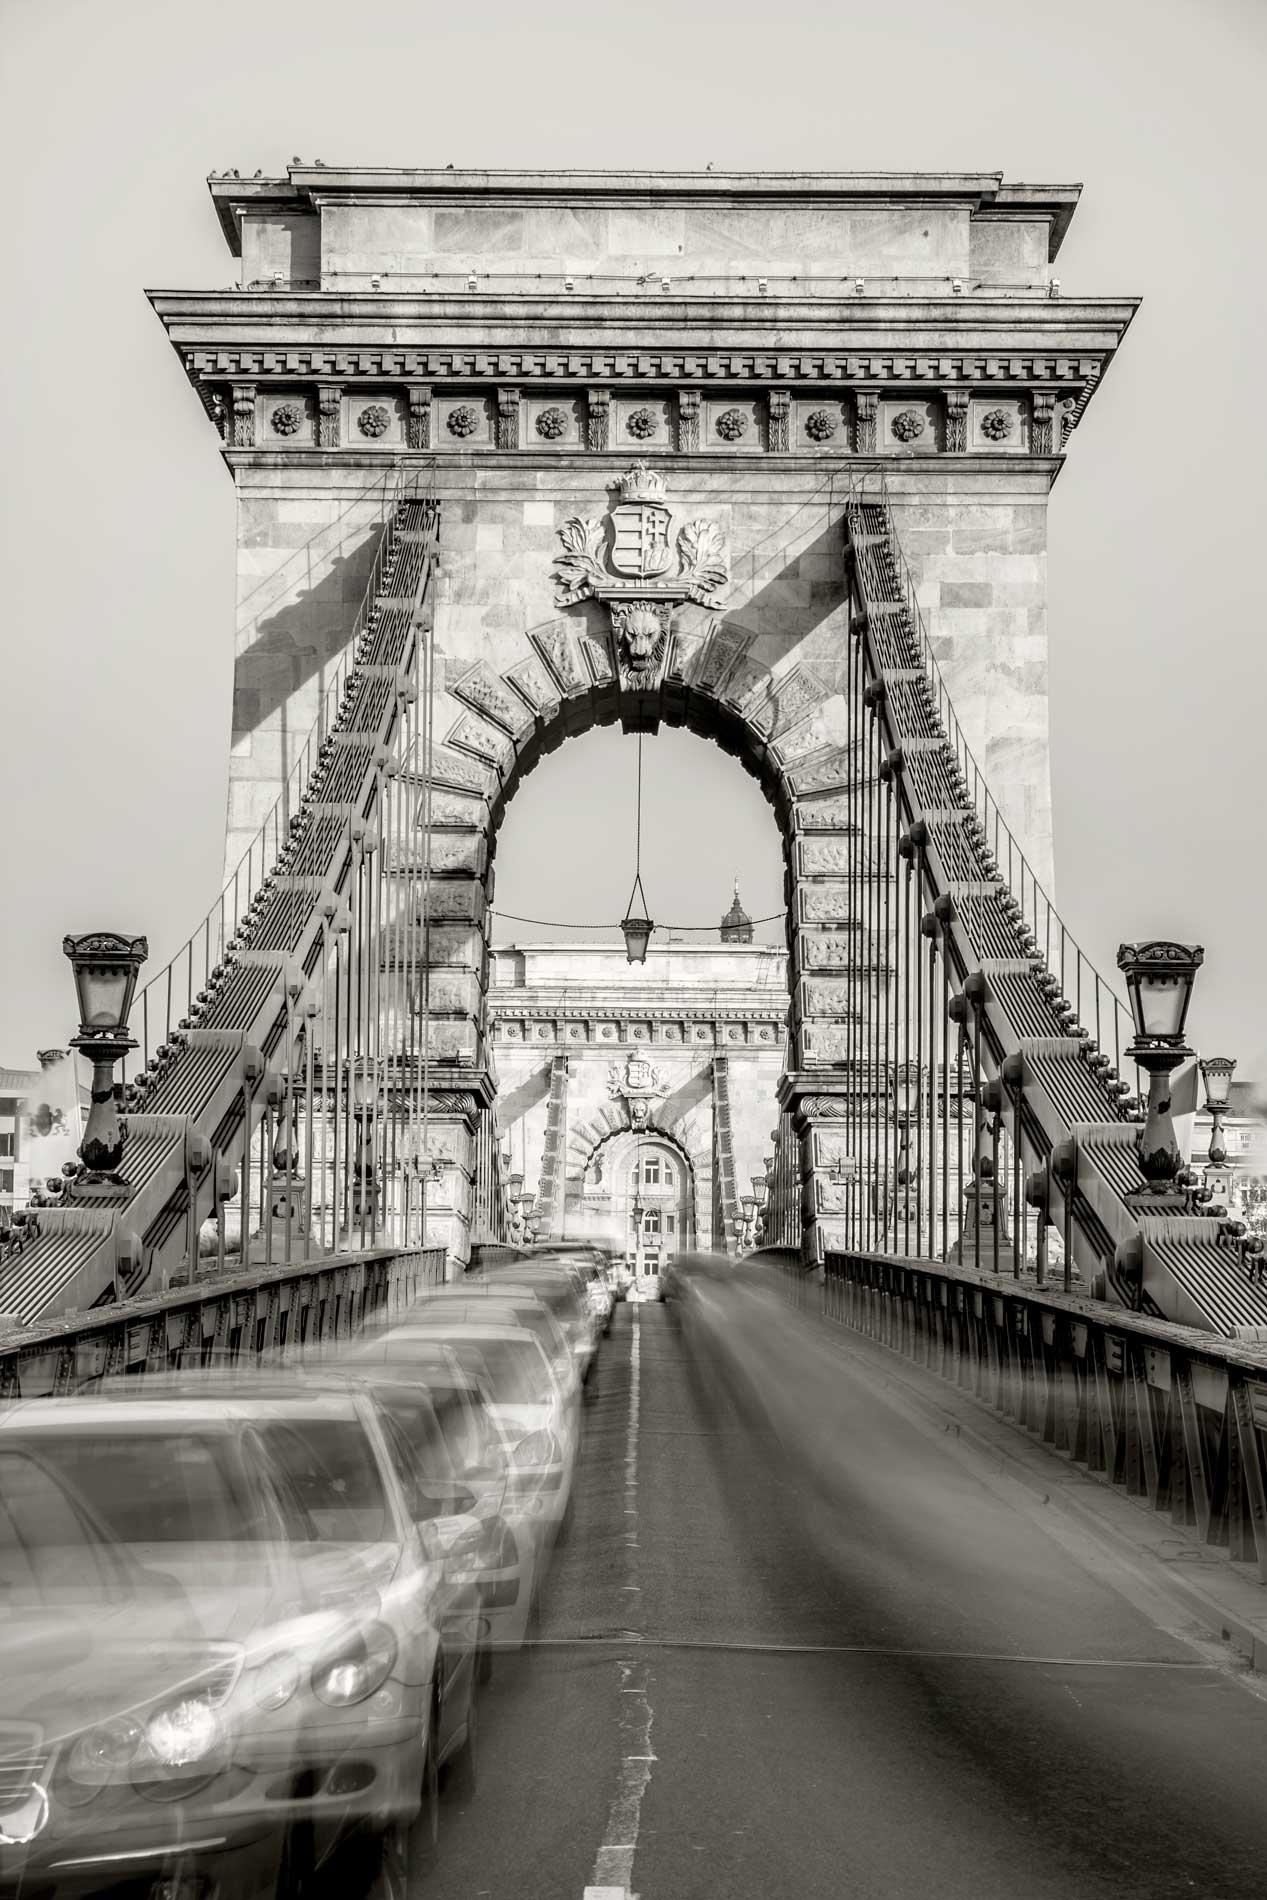 budapest_atthary_photography_bridge_15